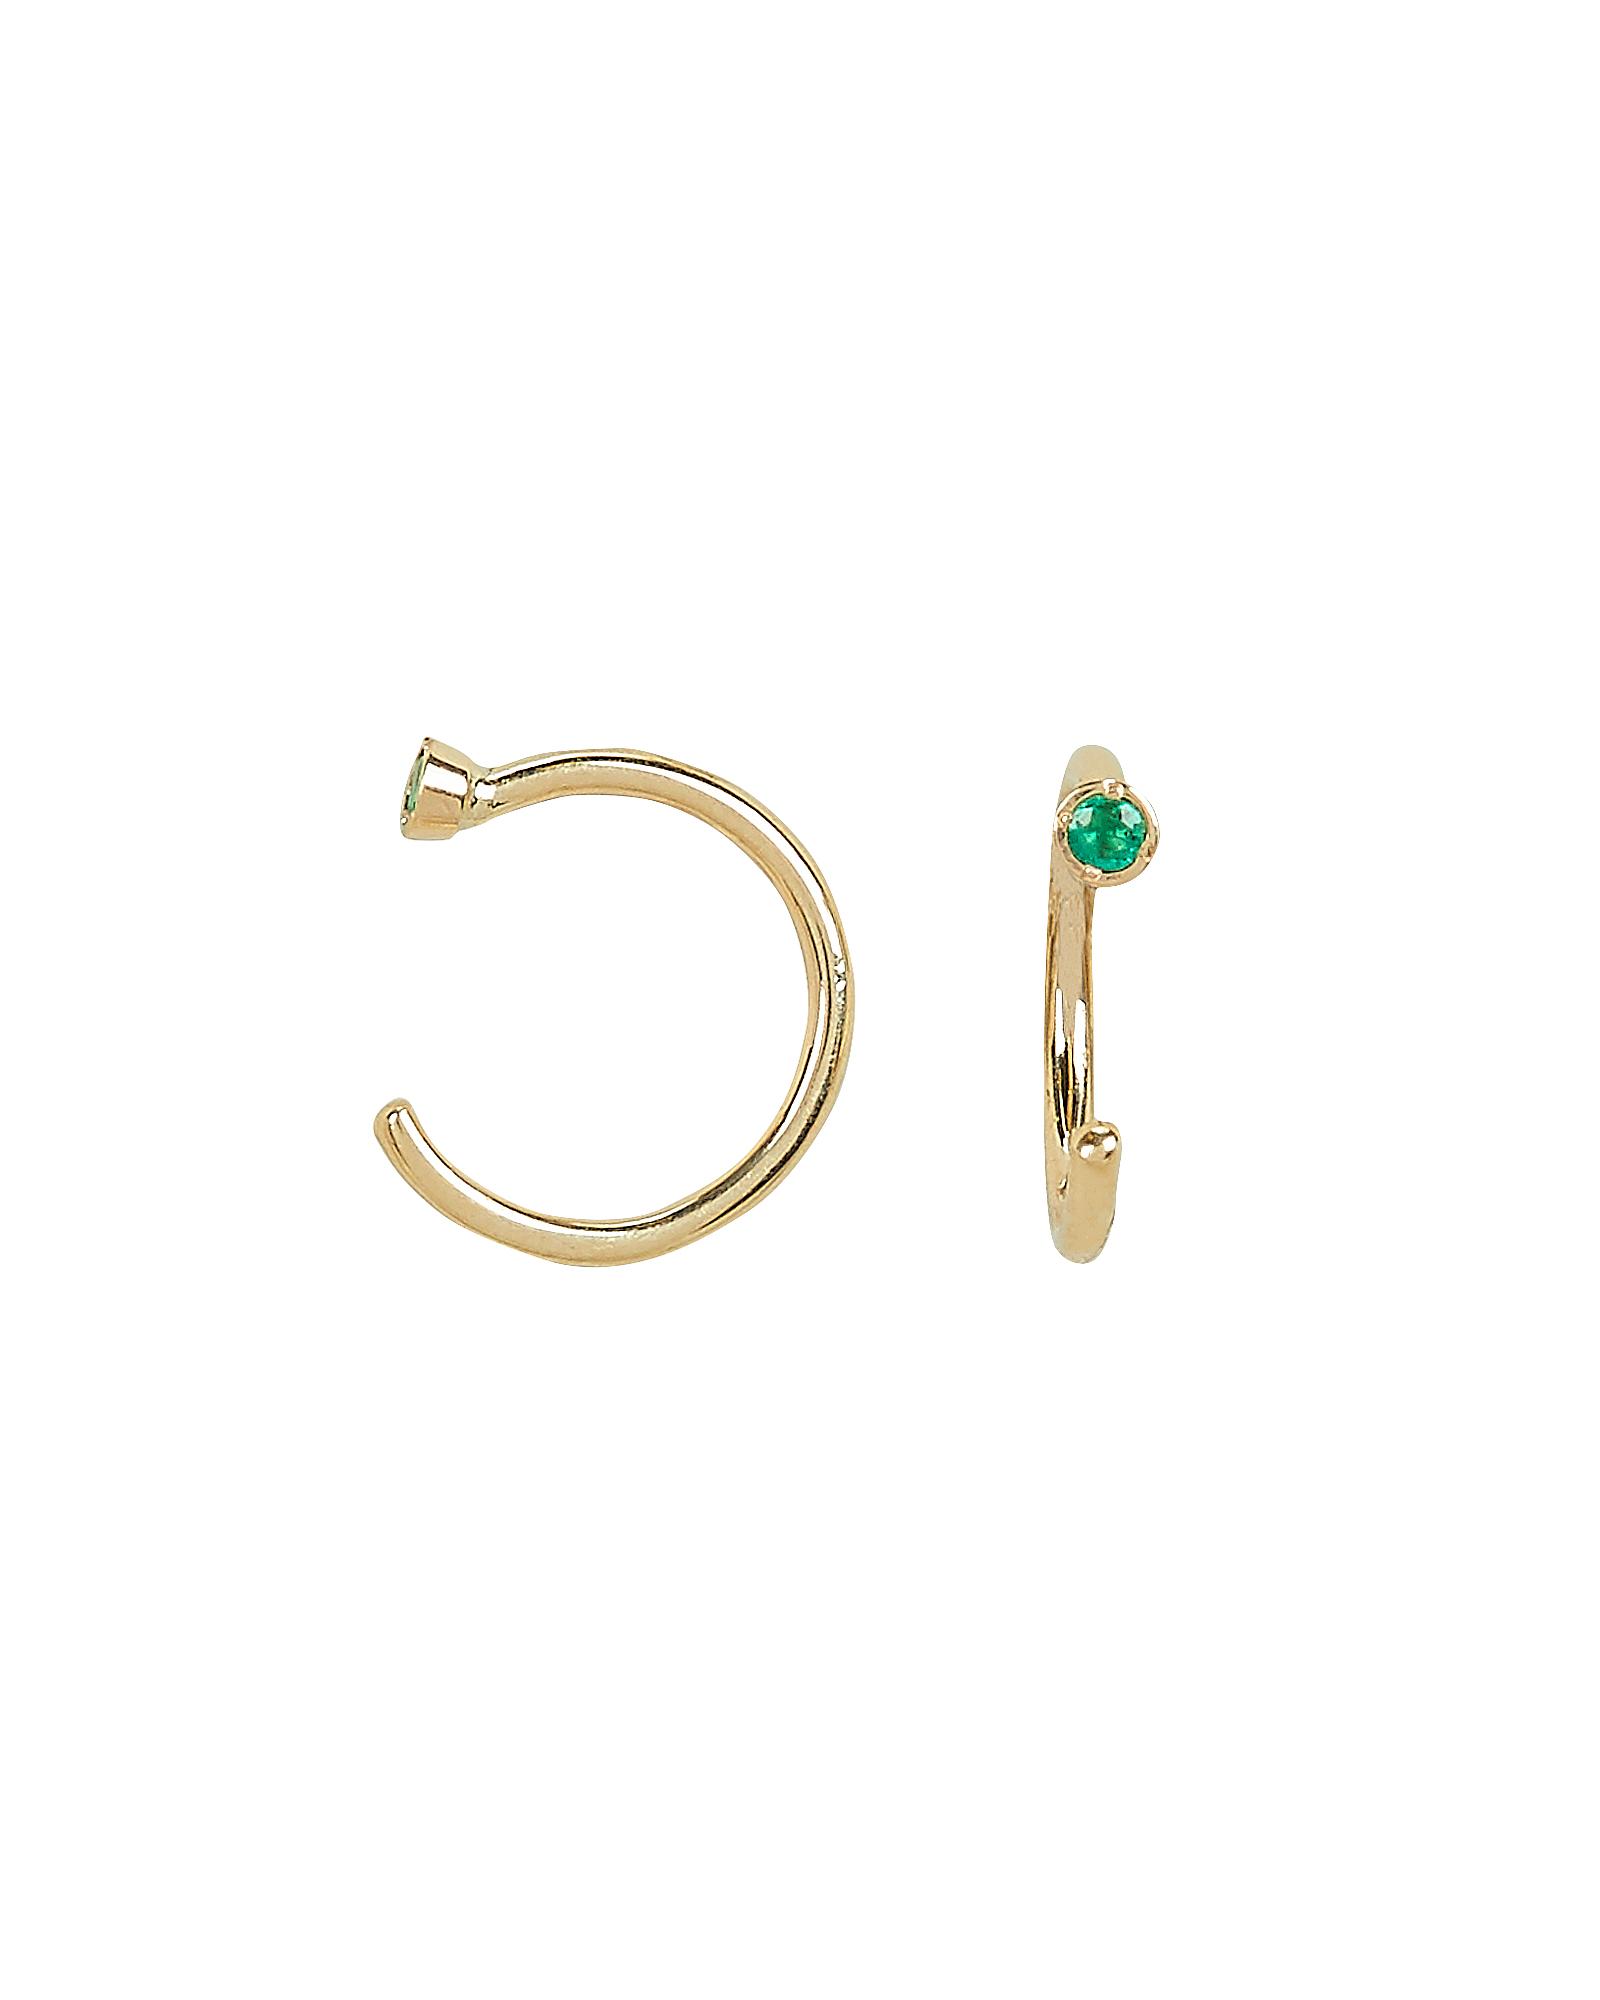 ARIEL GORDON JEWELRY Dual Emerald Birthstone Hoops